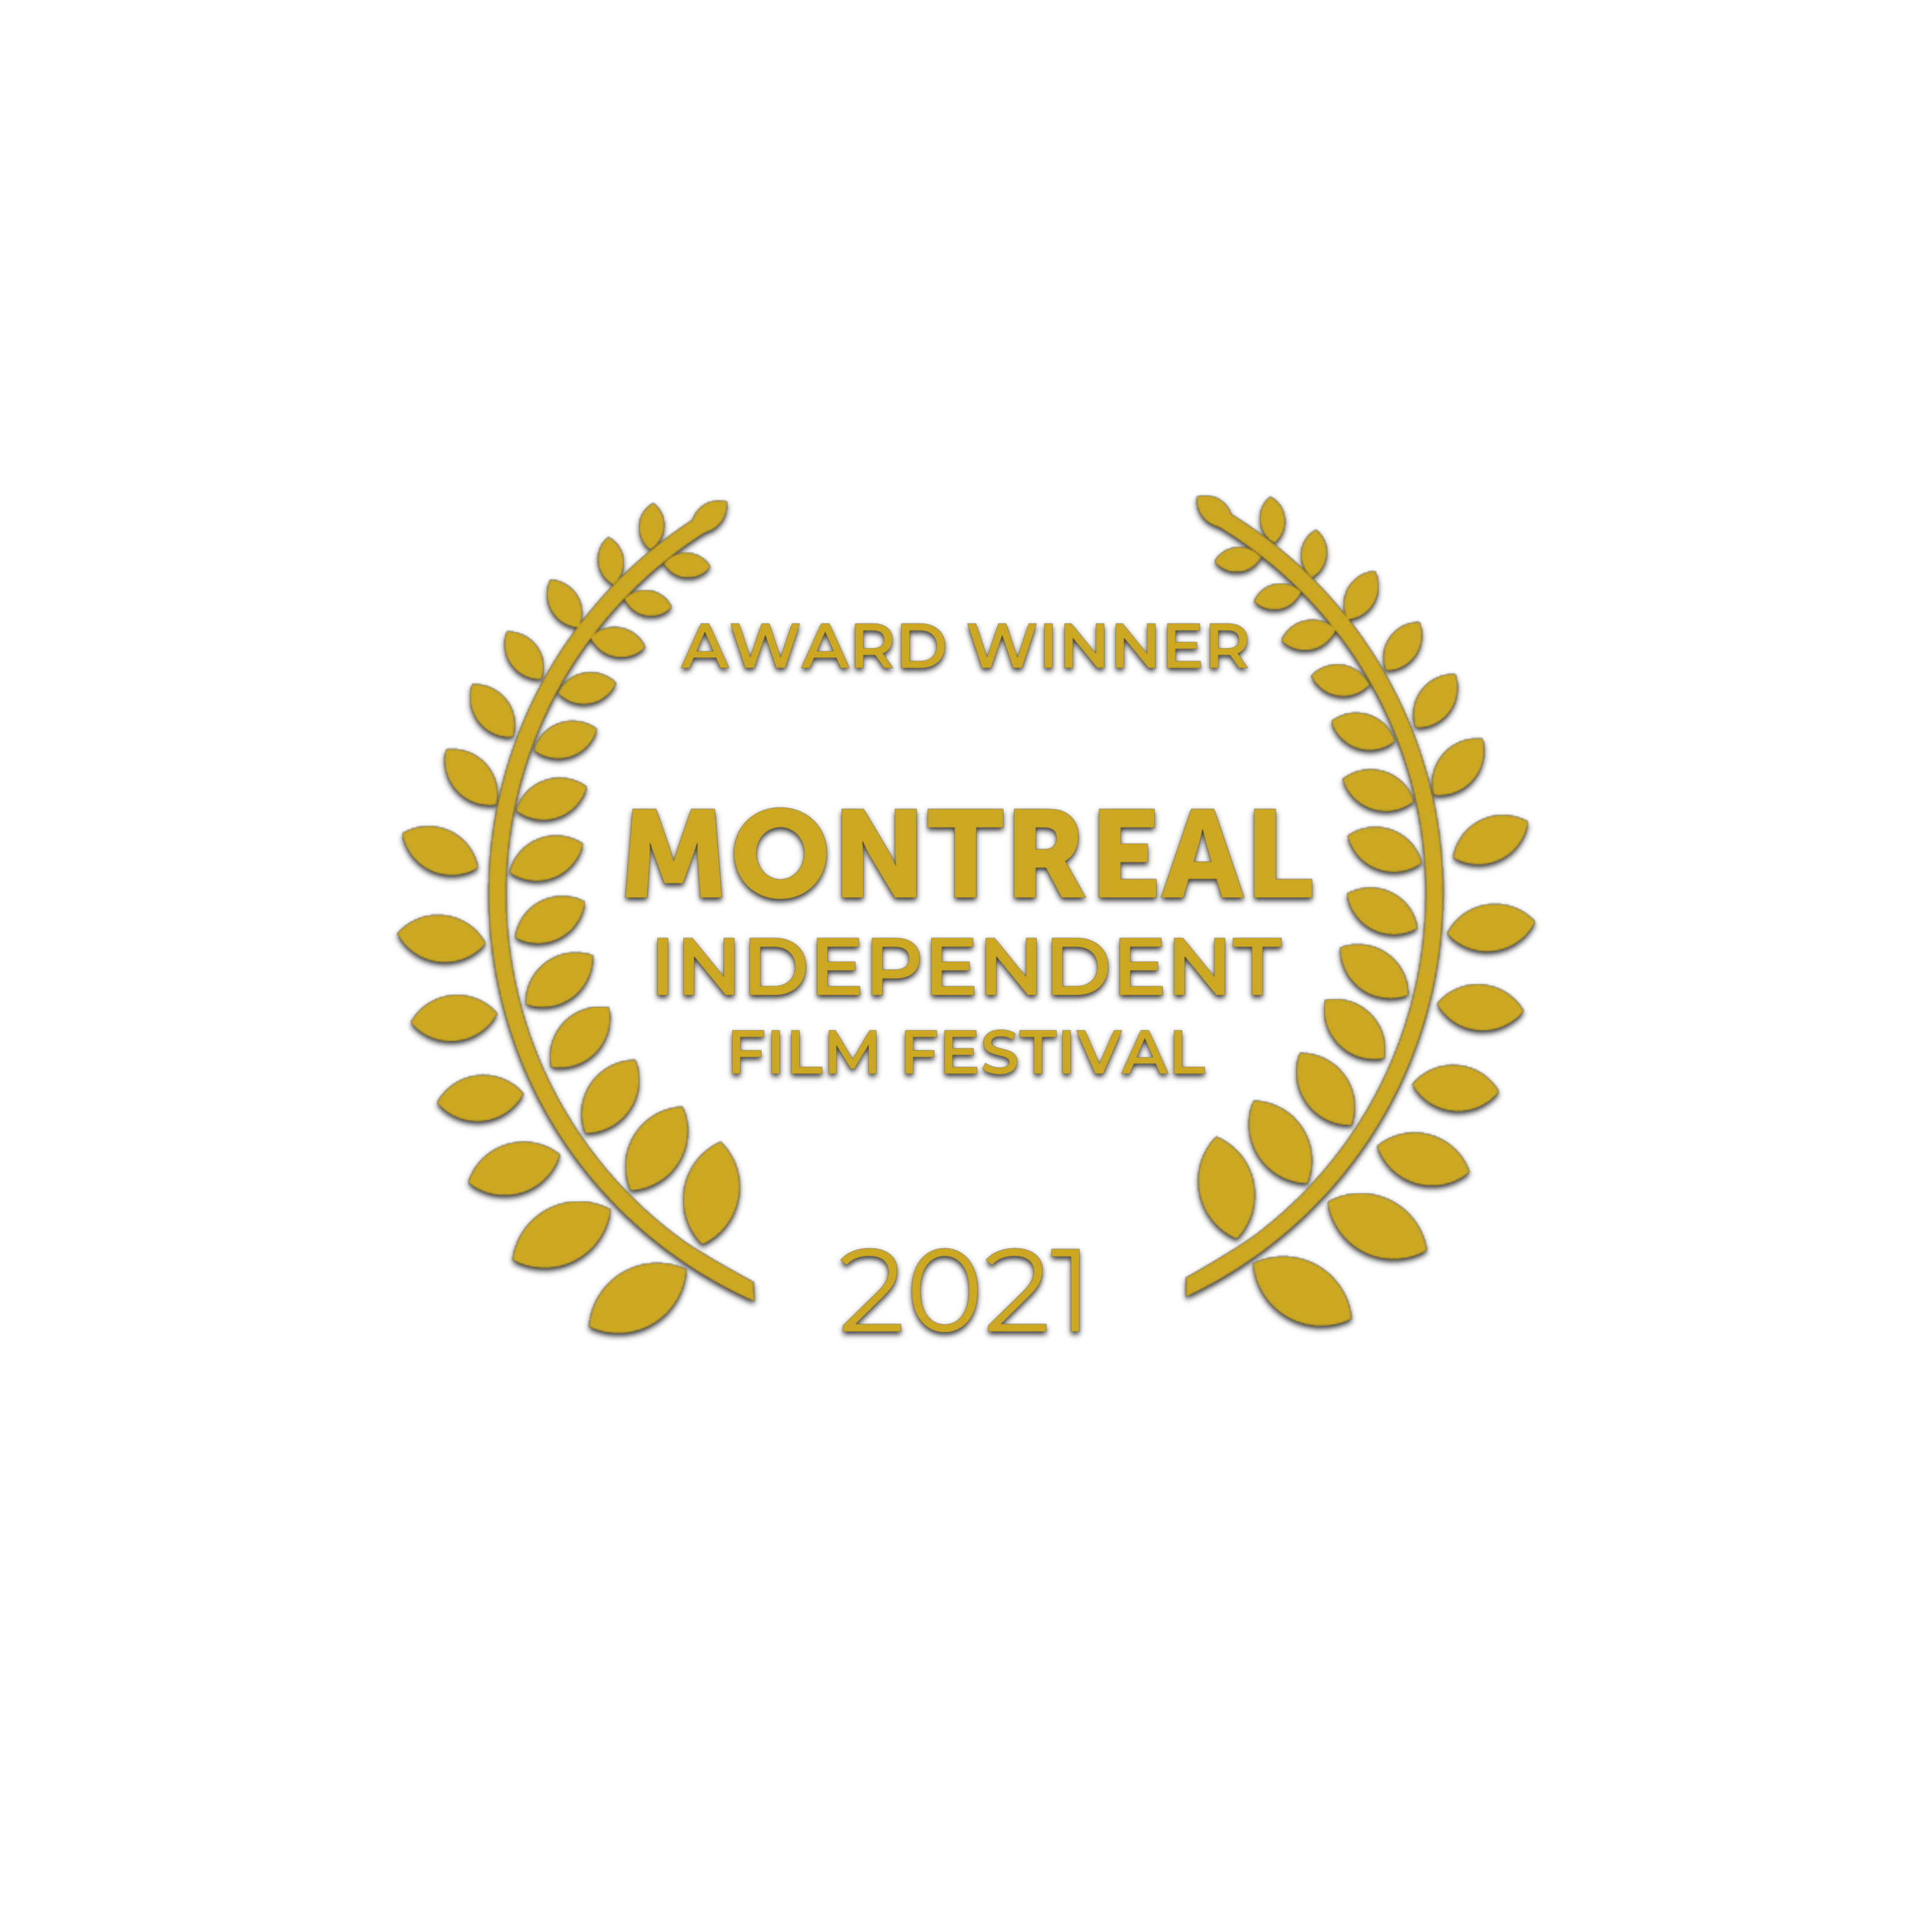 MOntreal Independent Film festival winner